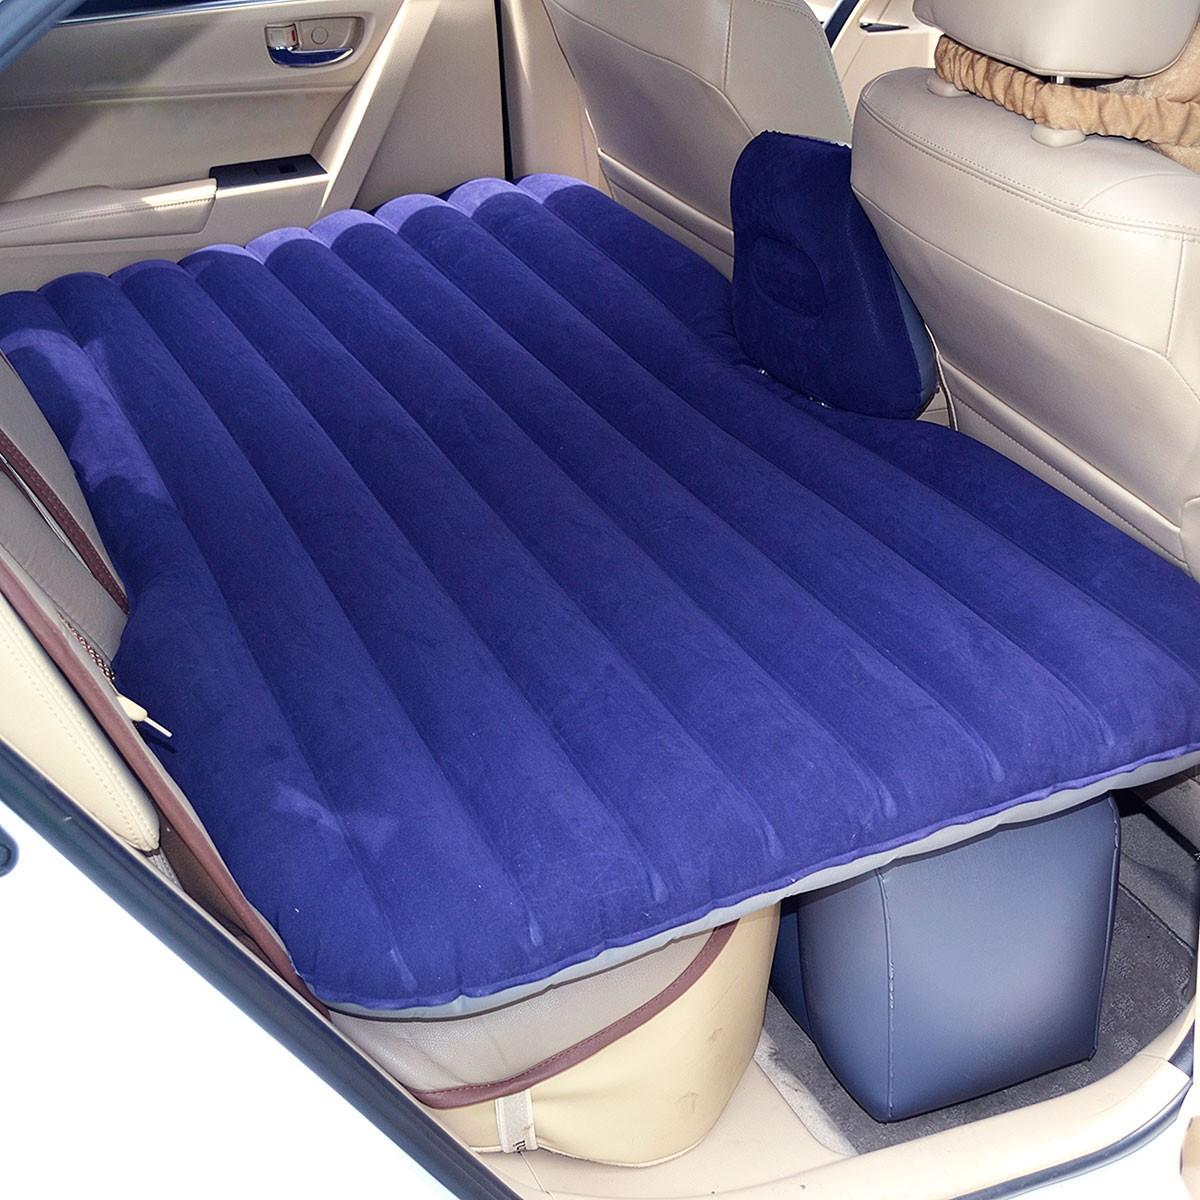 Orange Car Travel Inflatable Mattress (DK-IB1FO)